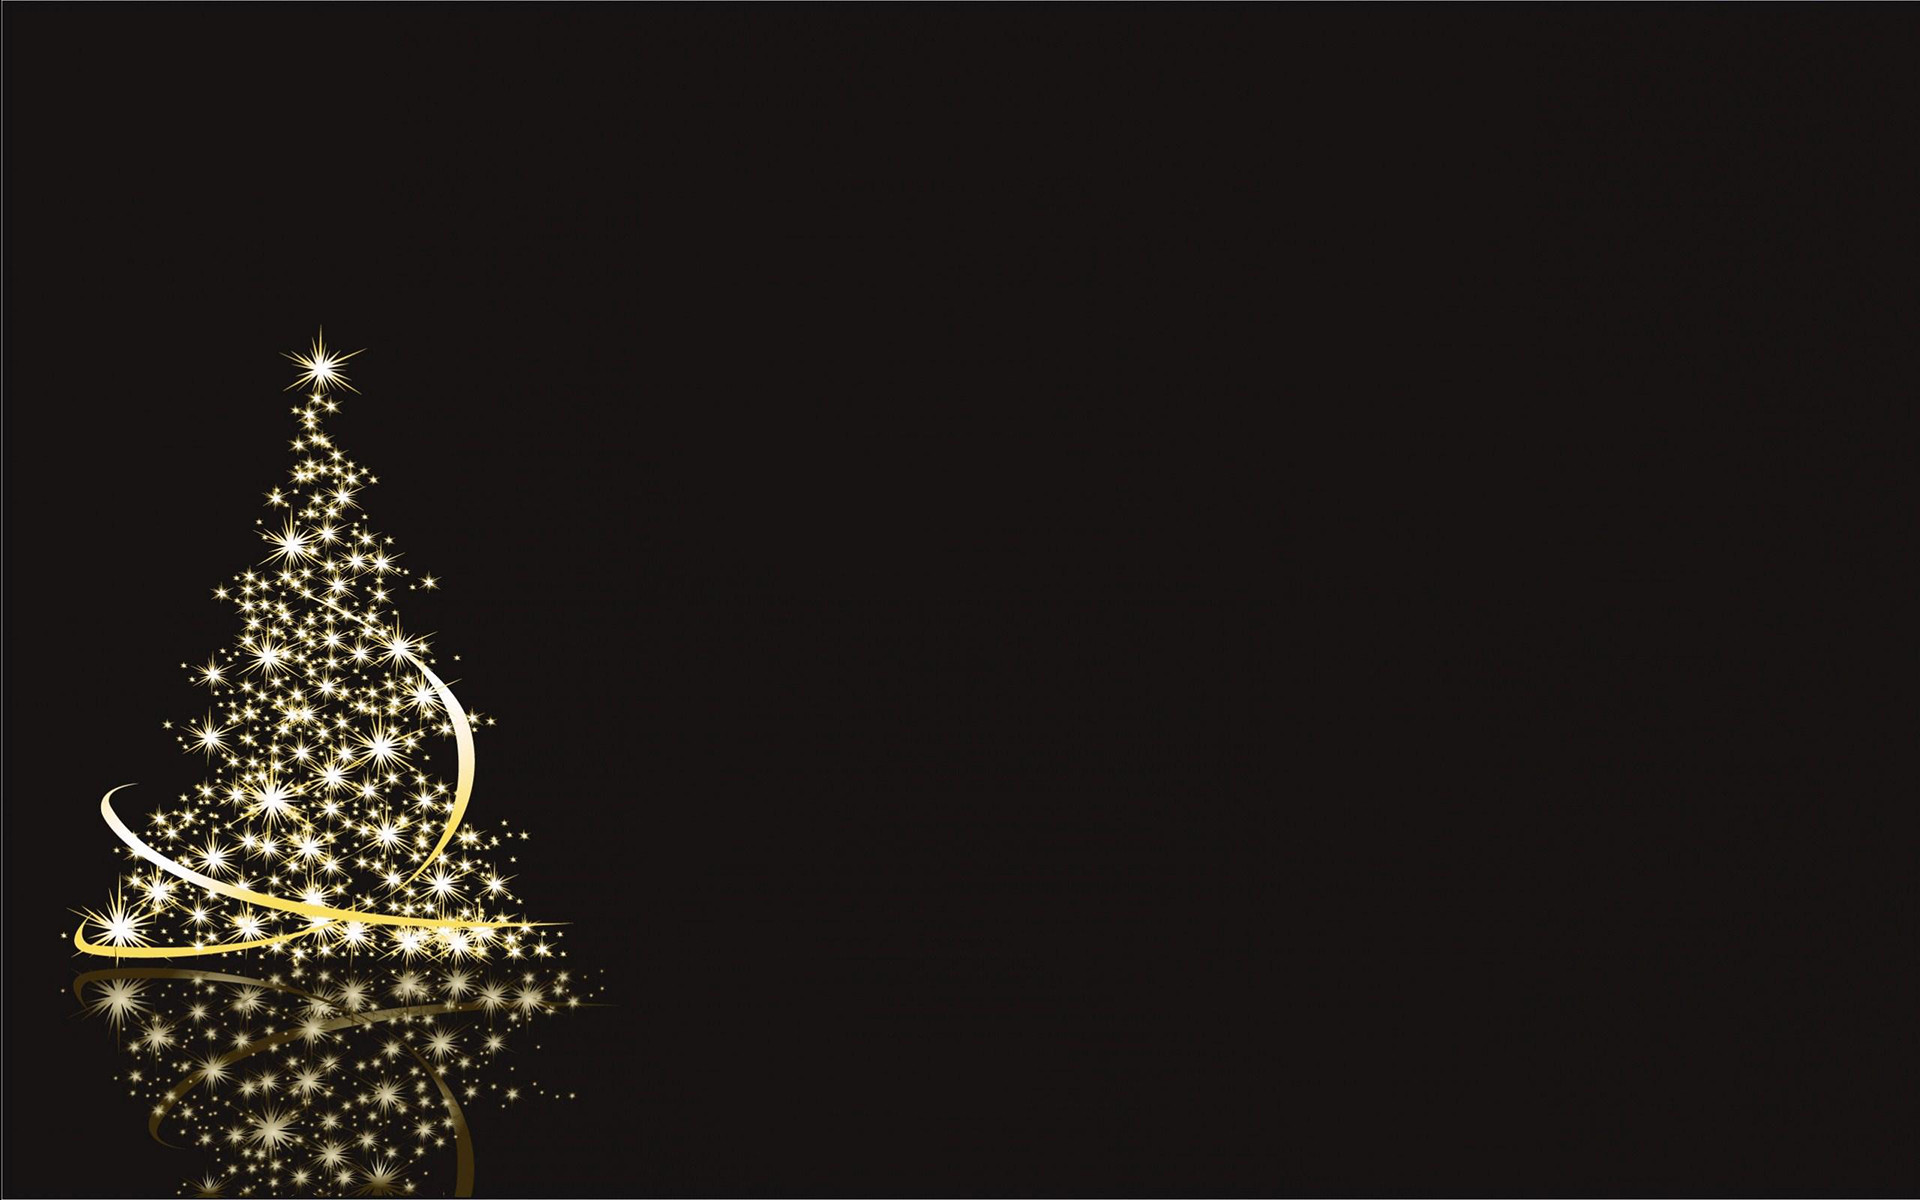 3D Christmas Backgrounds ·① WallpaperTag